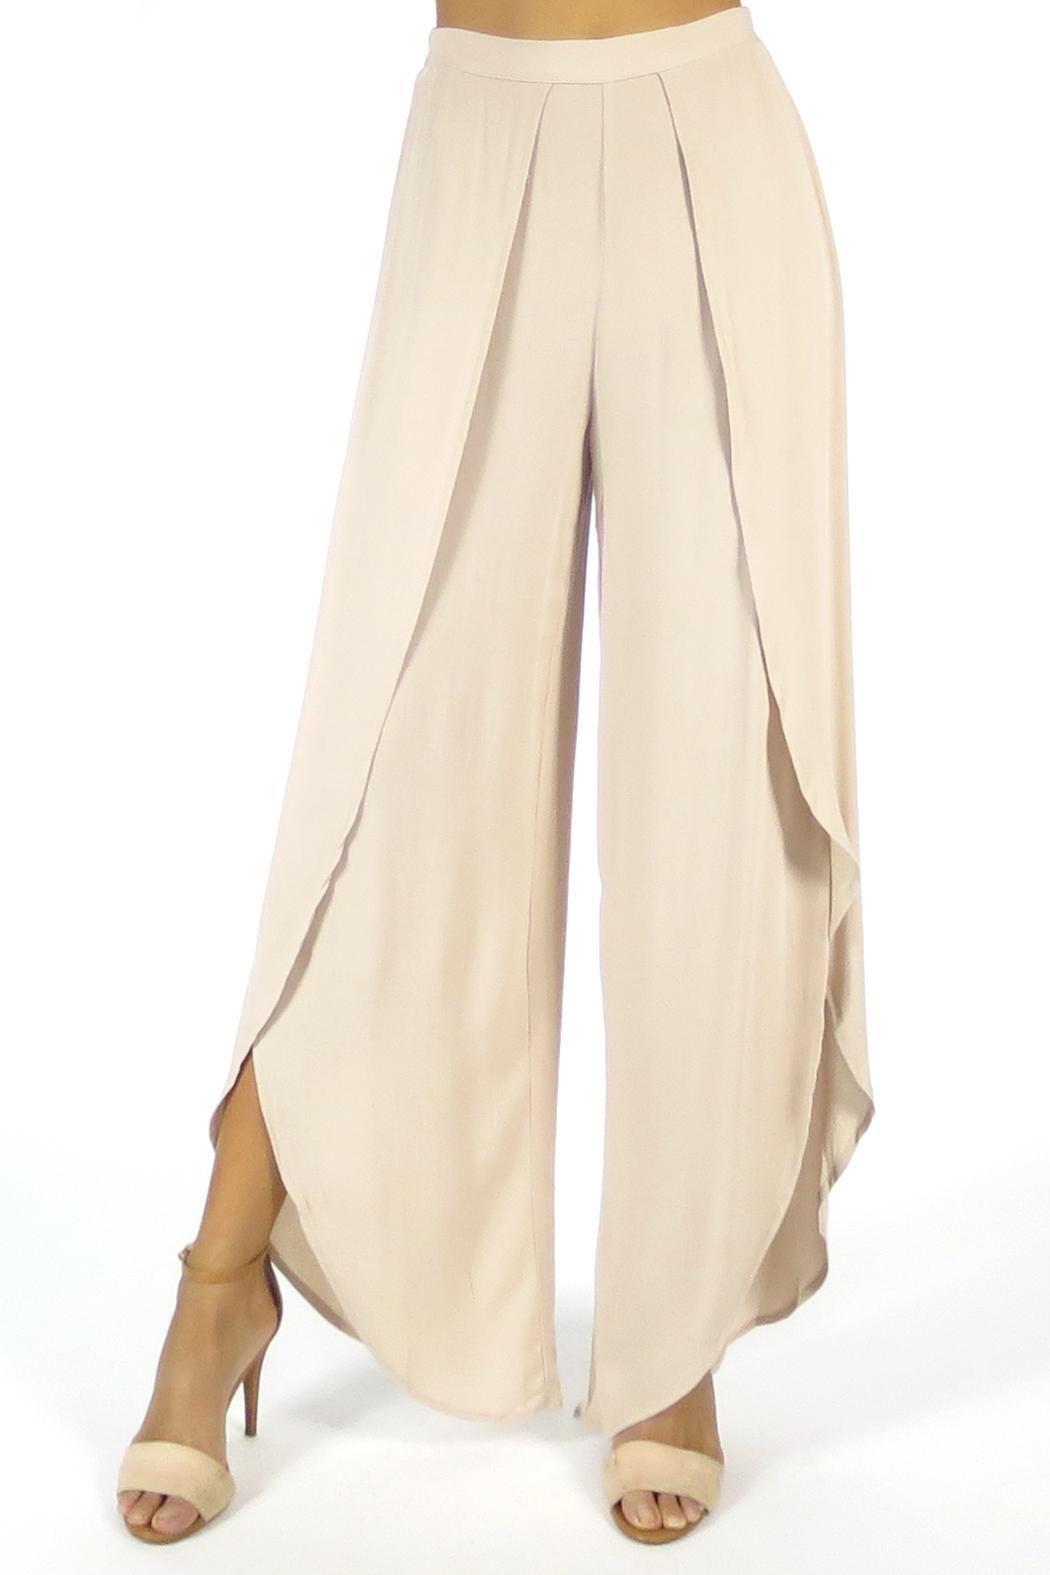 Tulip Pants - main | Ropa de moda | Pinterest | Costura, Ropa y ...